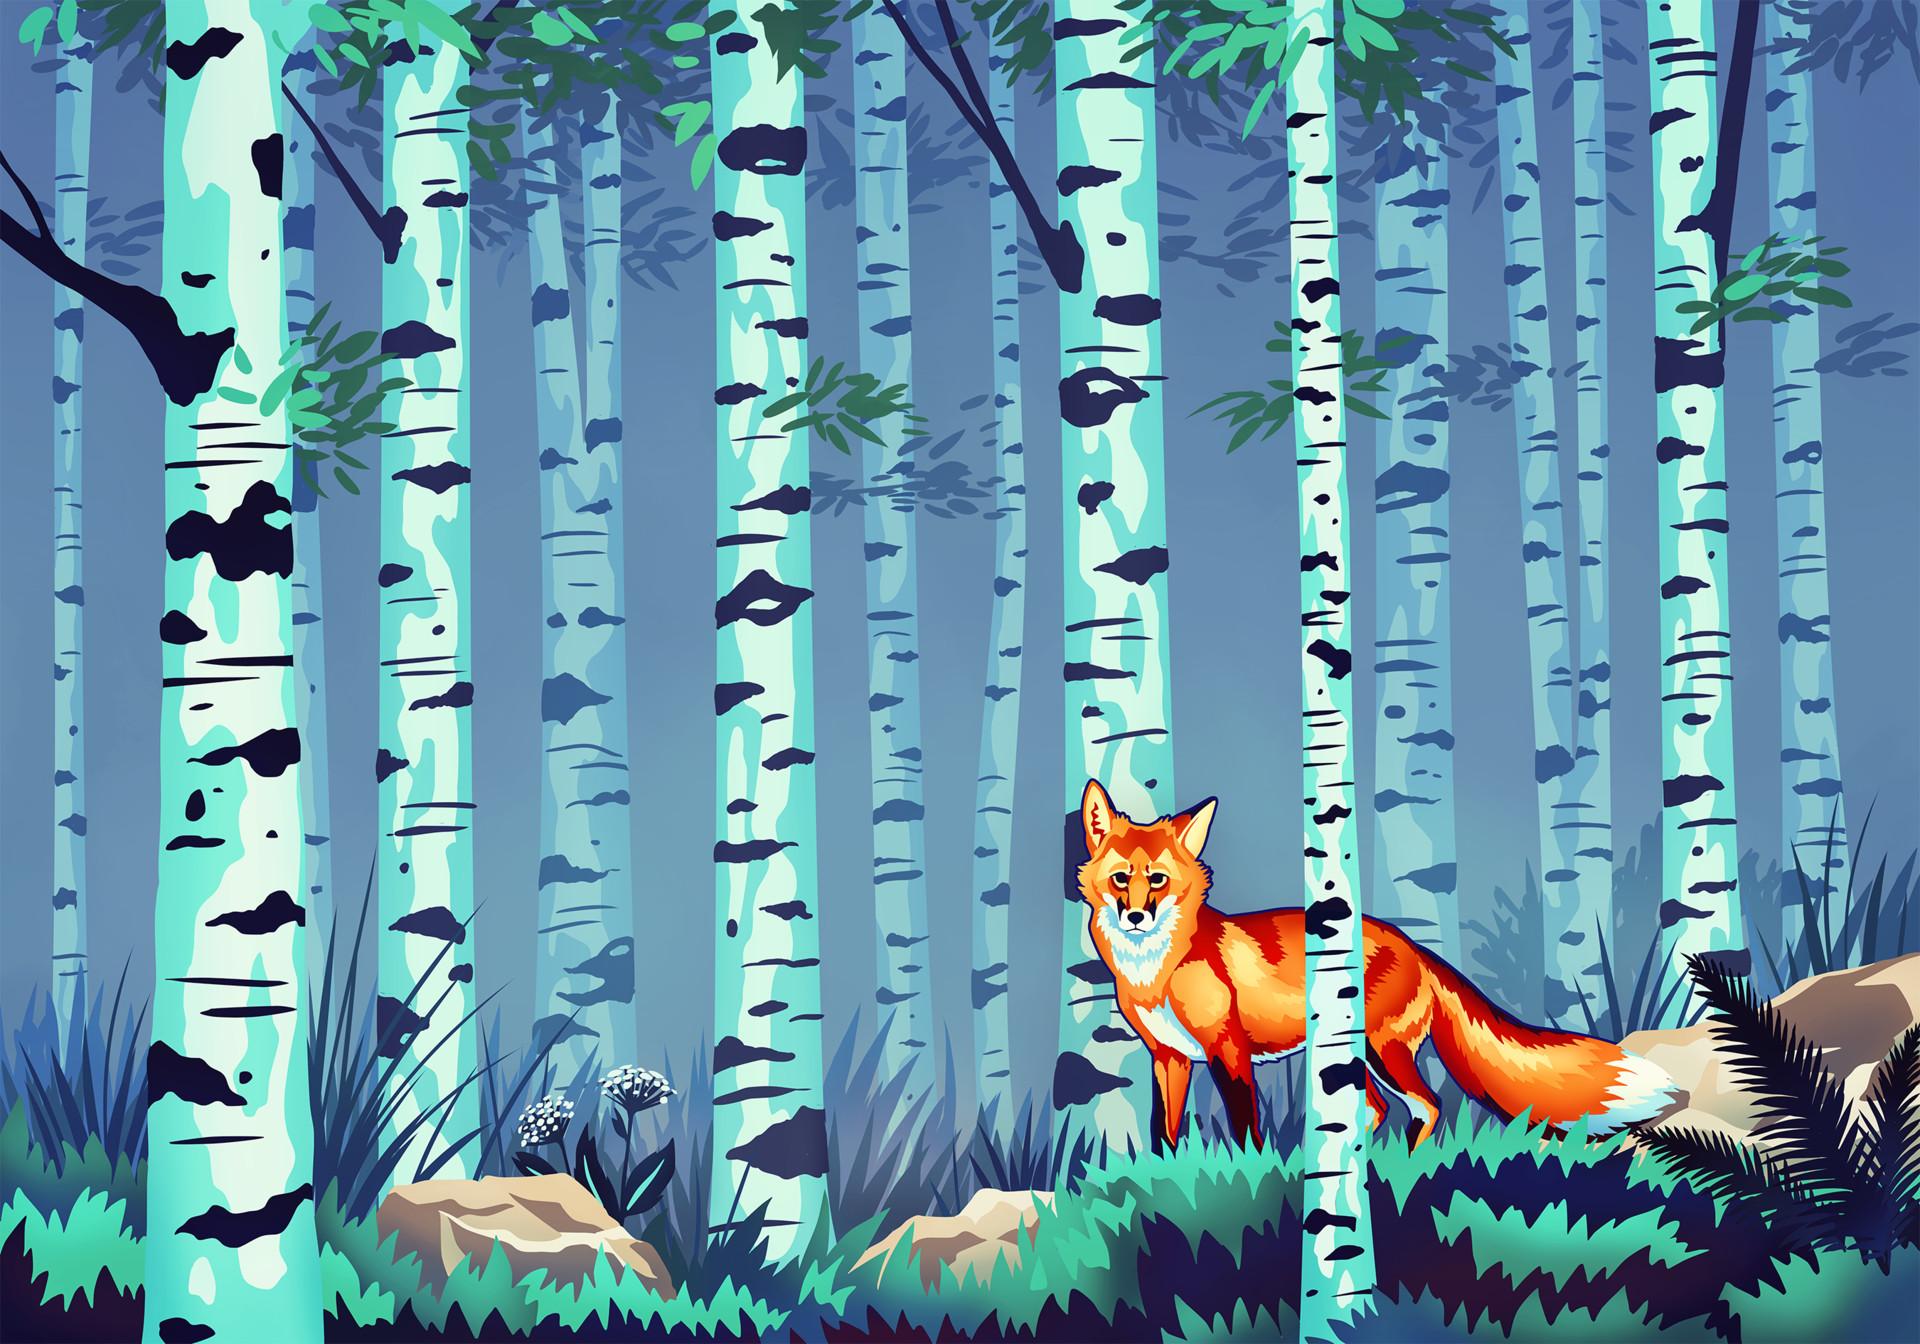 Martina nachazelova fox and birches sienna30